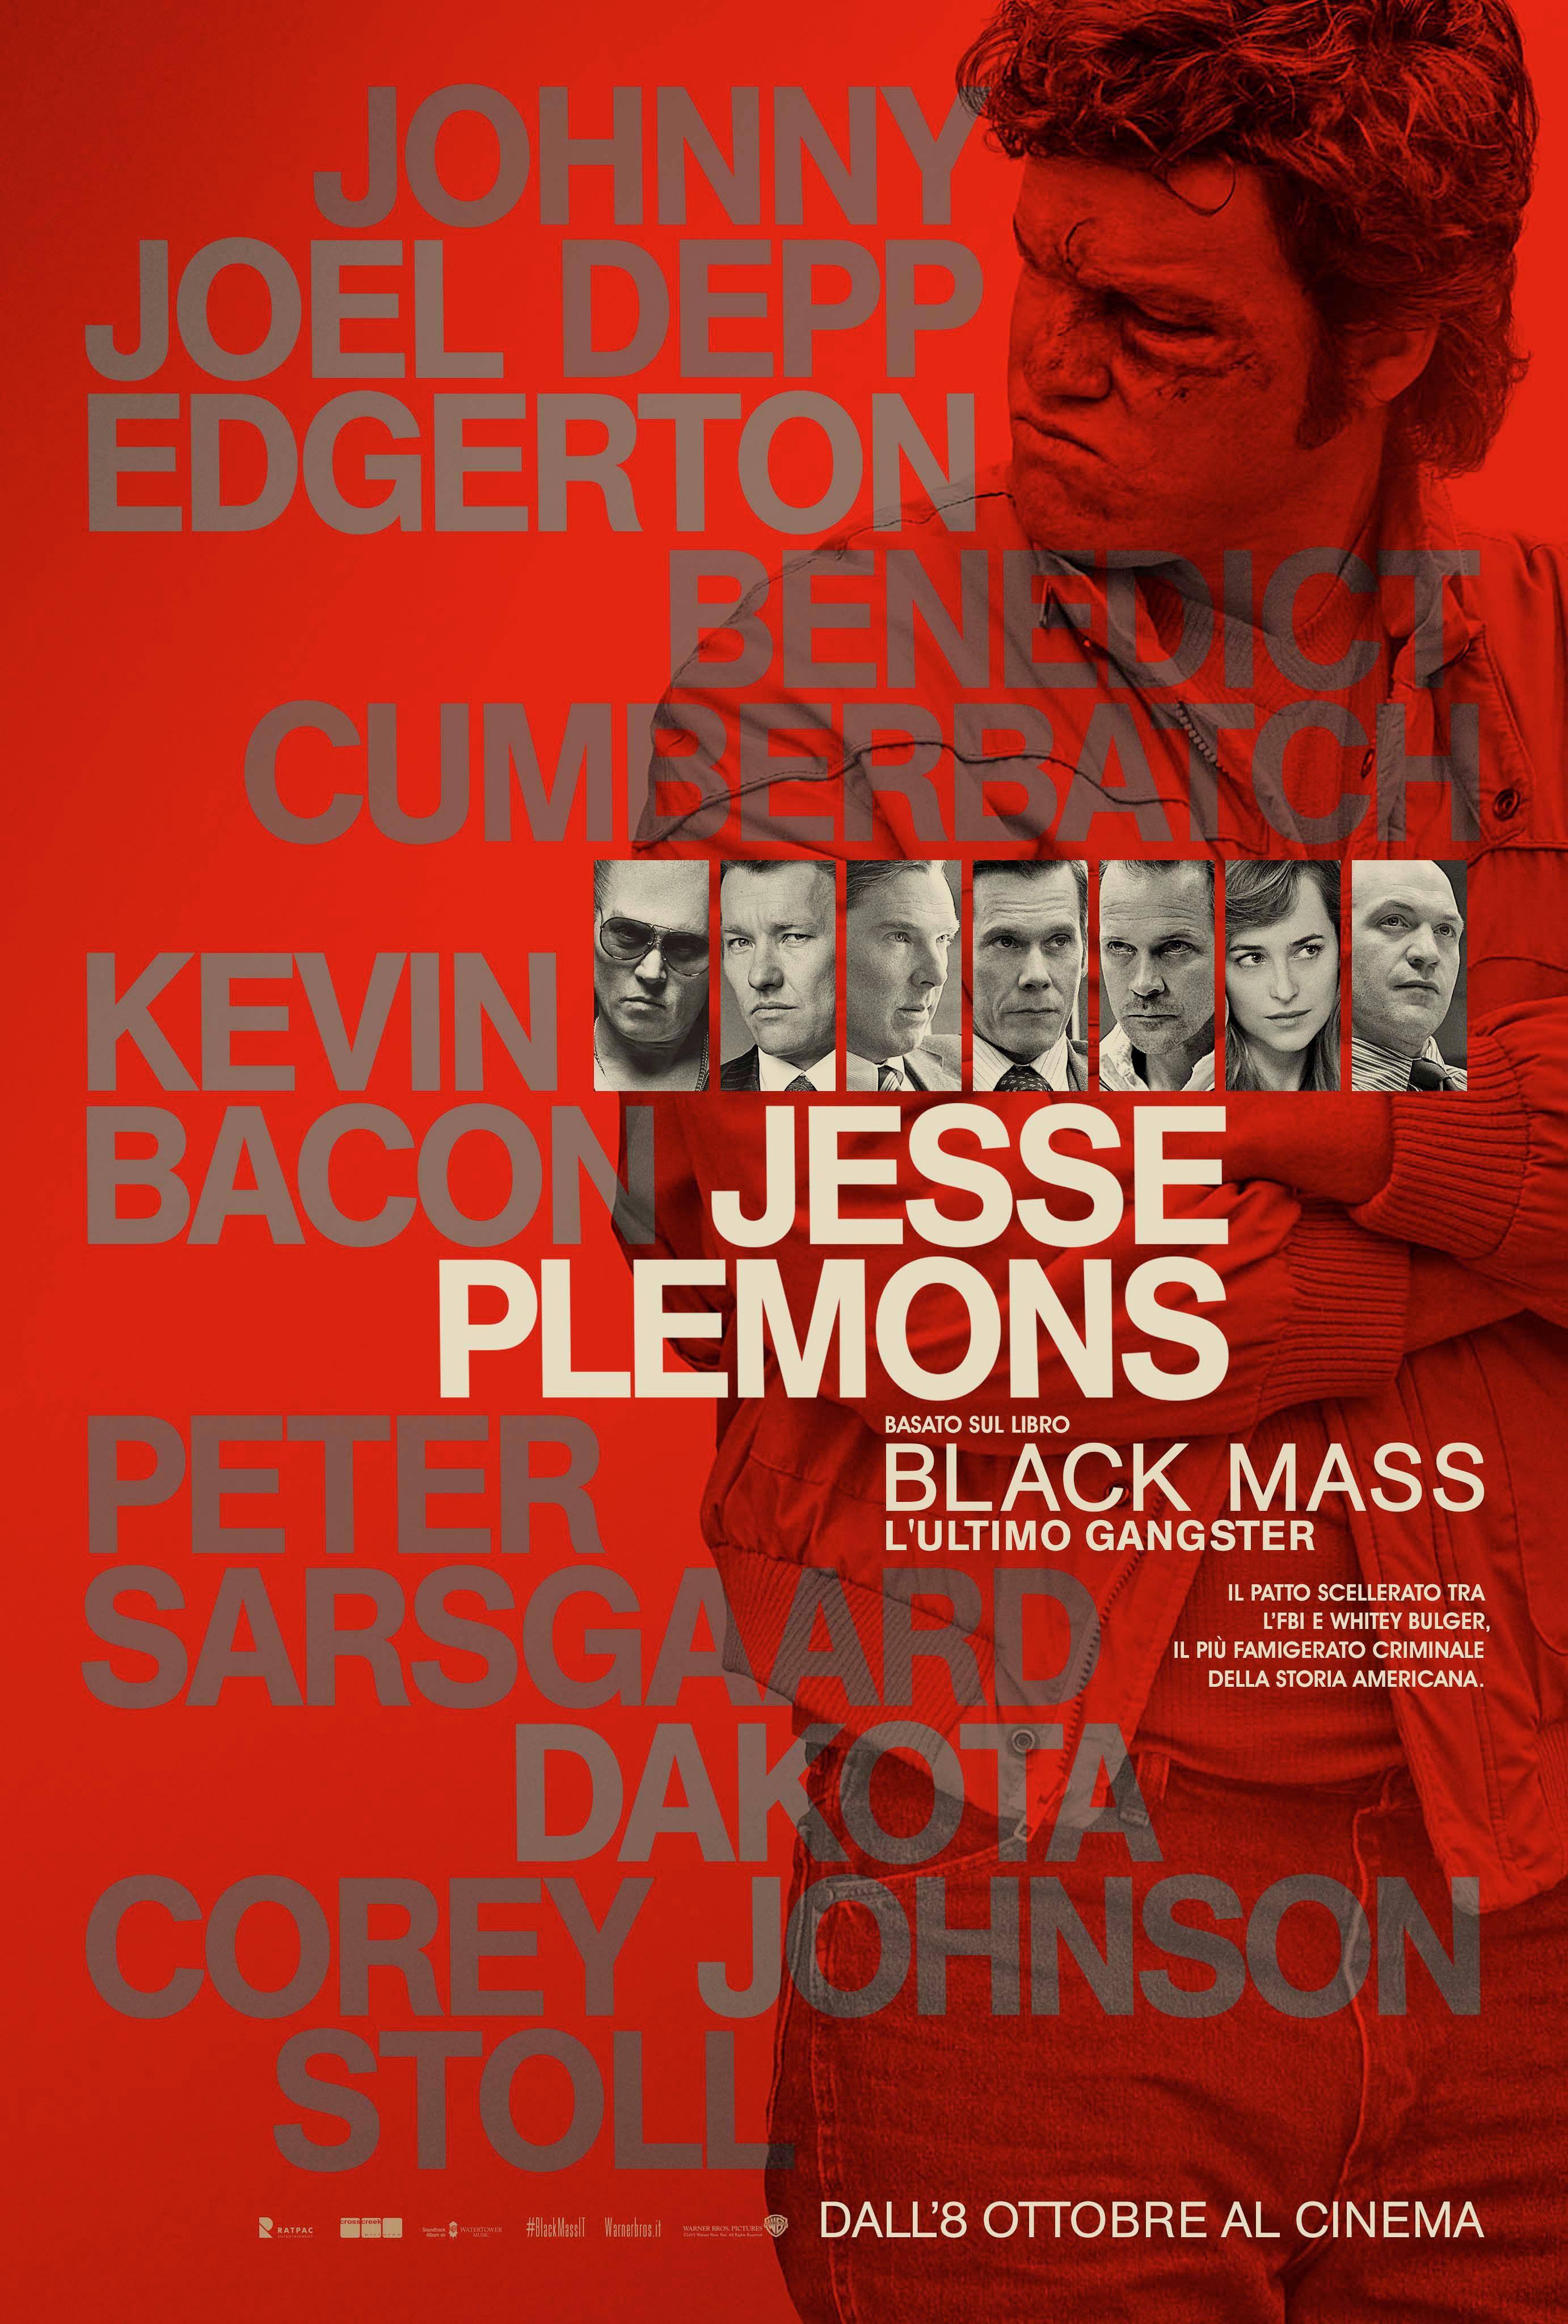 Black Mass - L'ultimo gangster: il character poster di Jesse Plemons